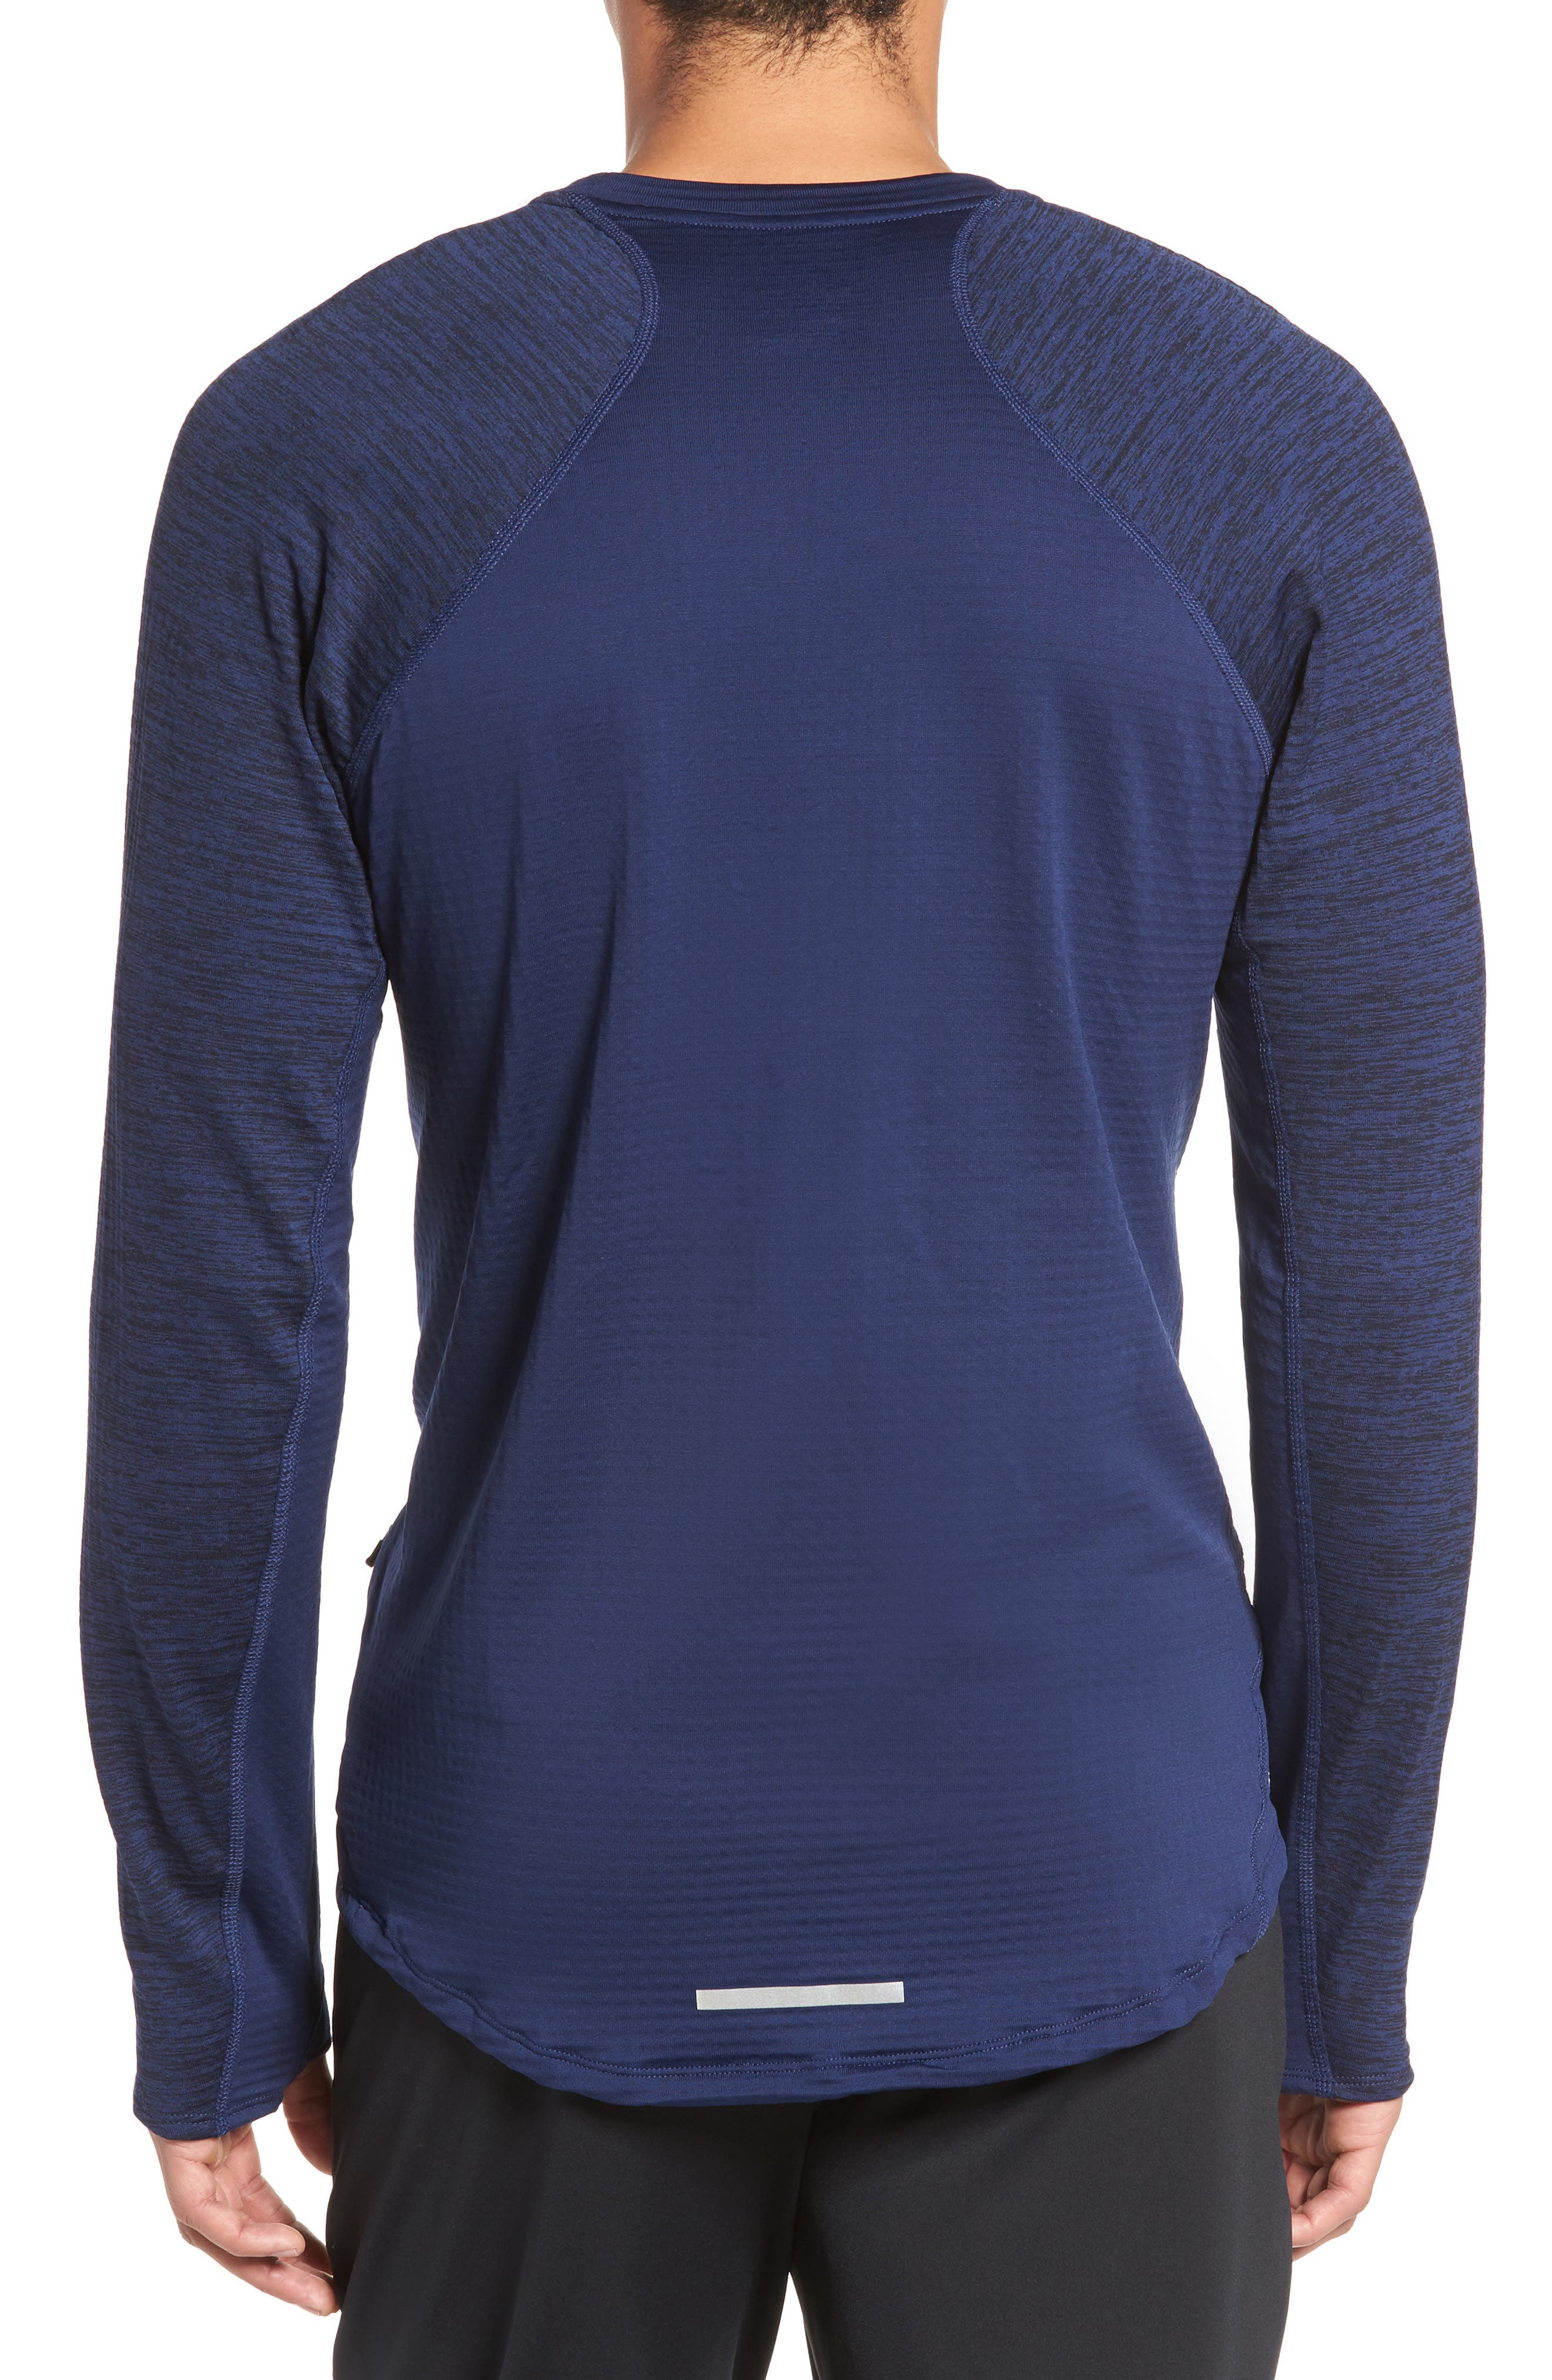 ThermaSphere Long Sleeve Running T-Shirt,                             Alternate thumbnail 6, color,                             Binary Blue/ Purple/ Heather